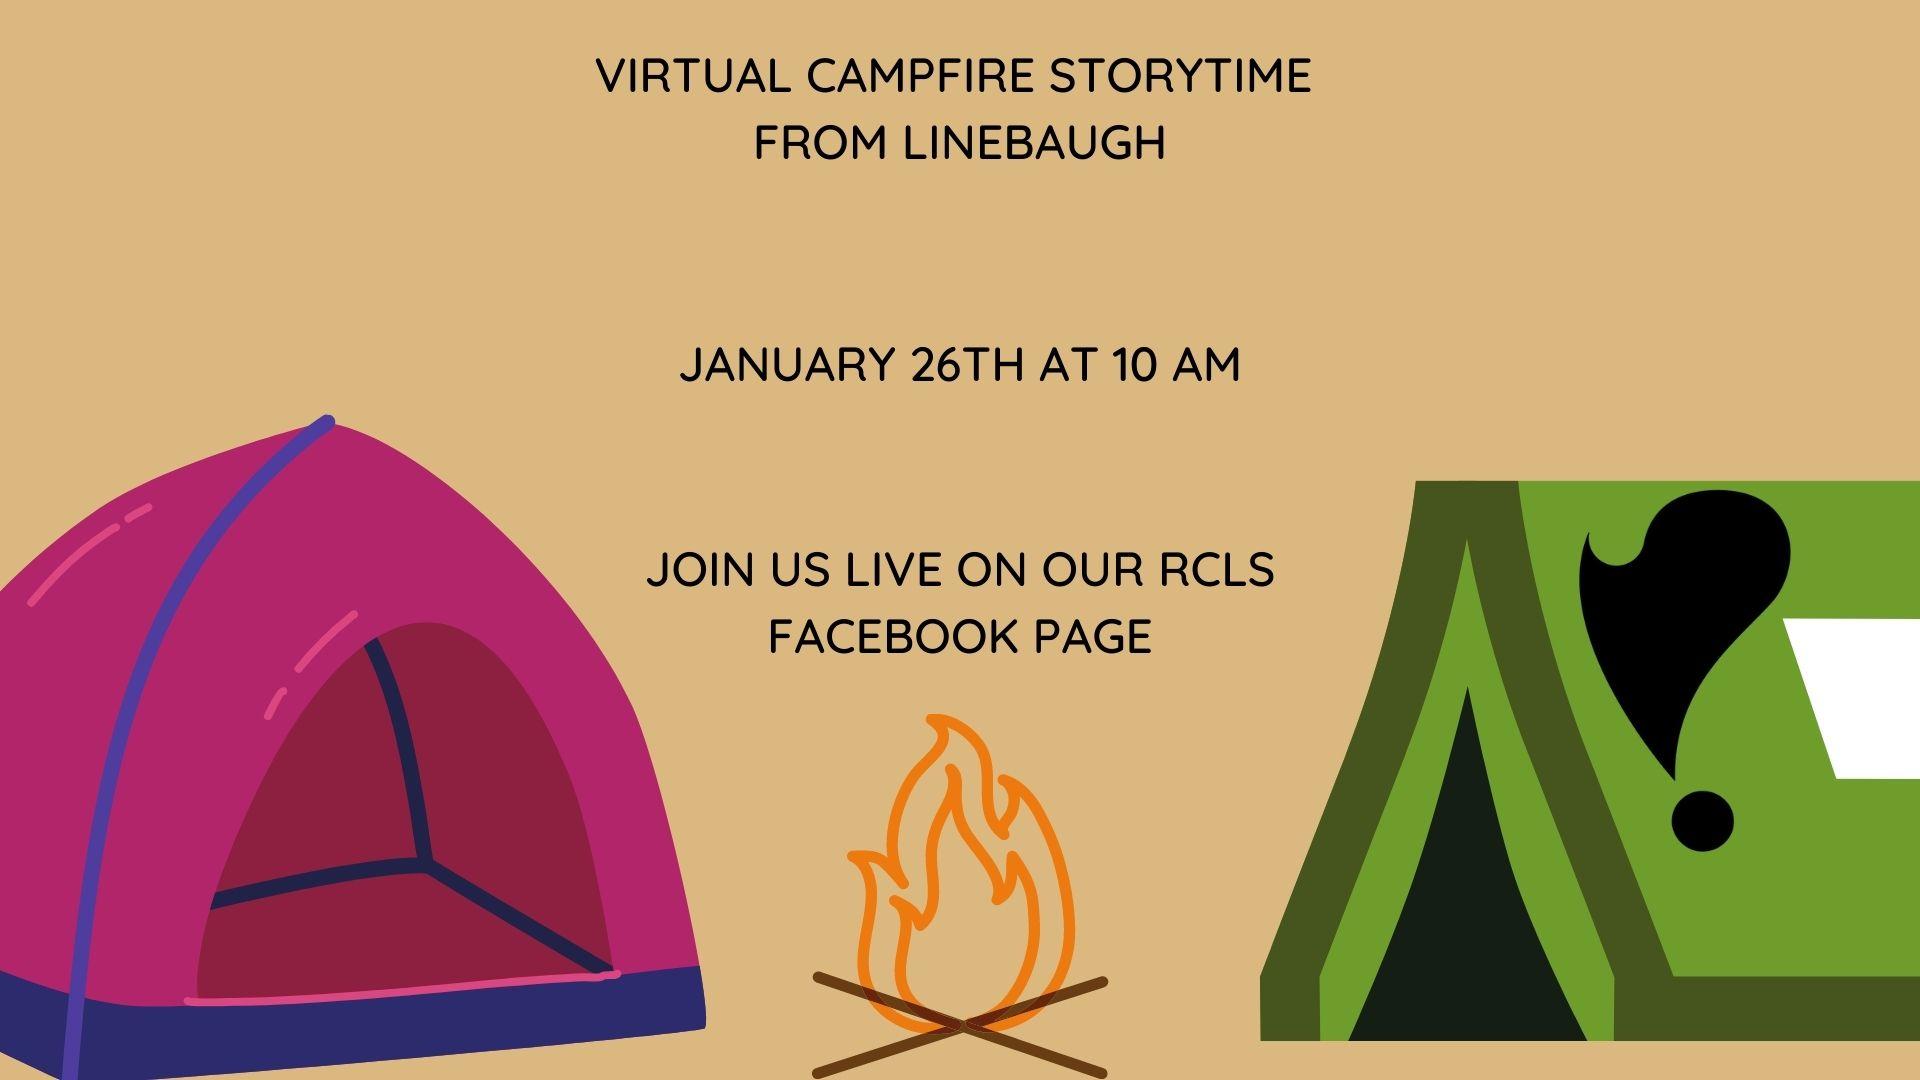 Campfire Virtual Story Time